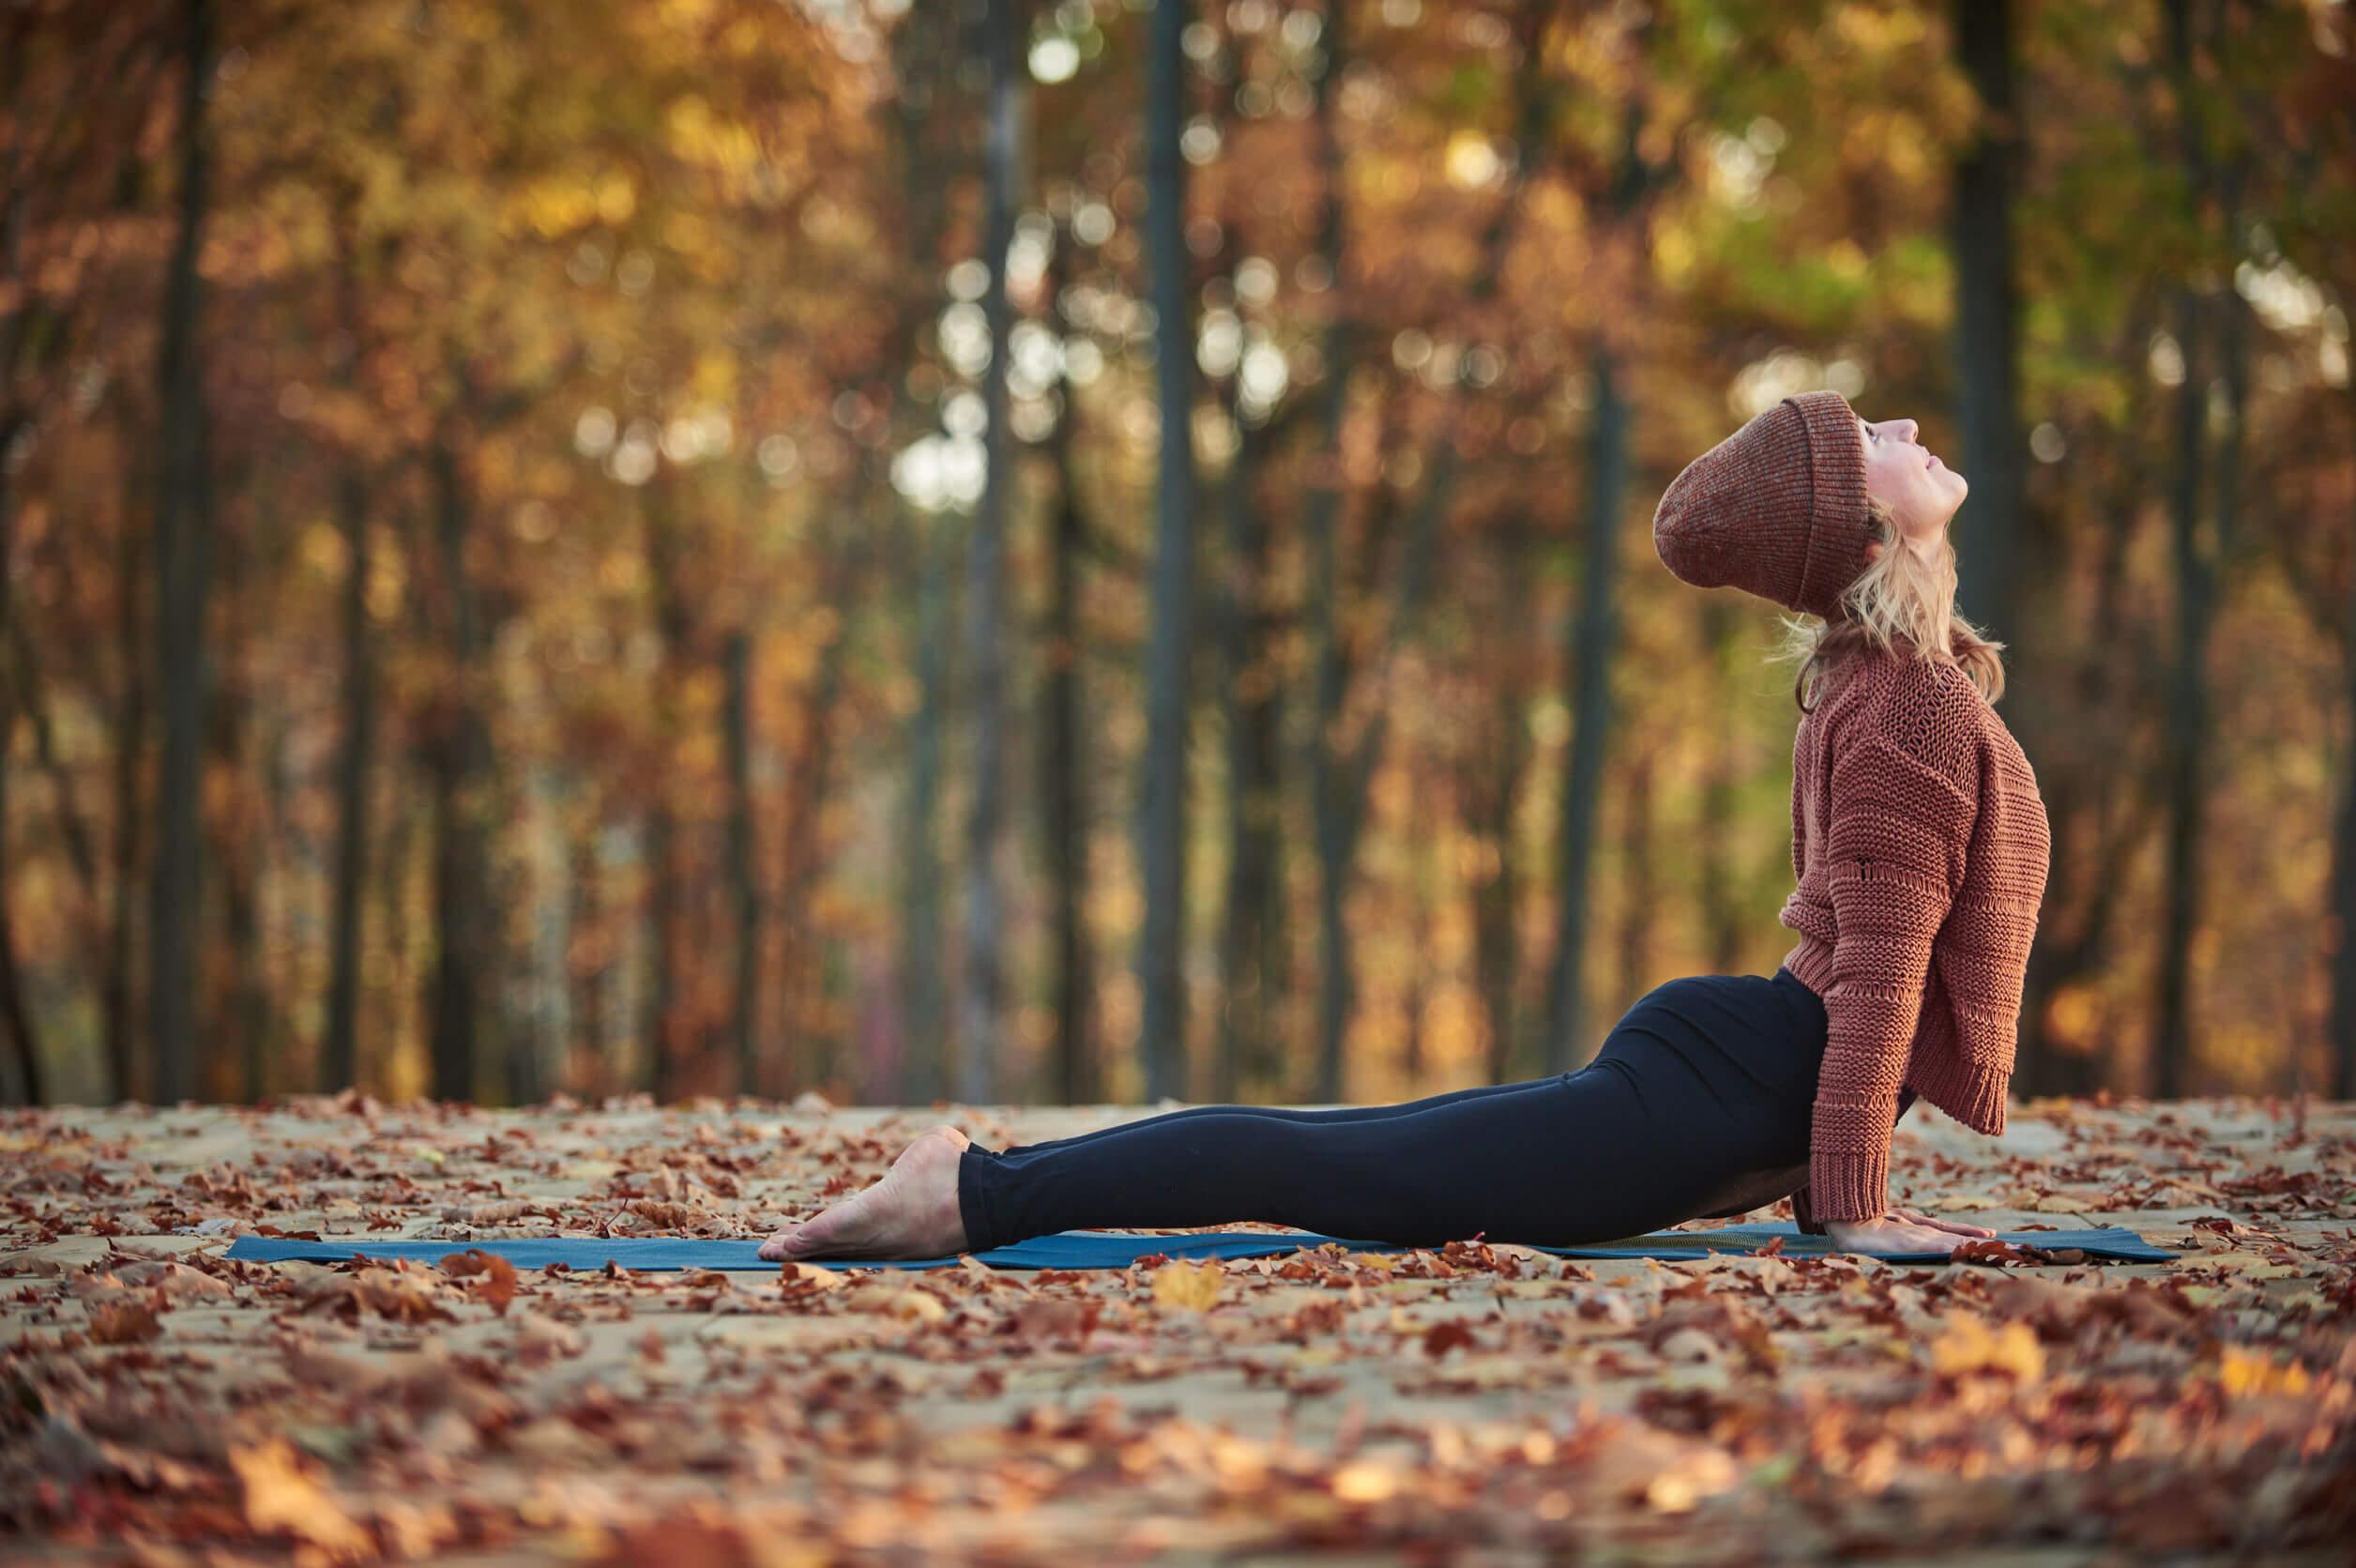 Fibromyalgia and sleep can be improved